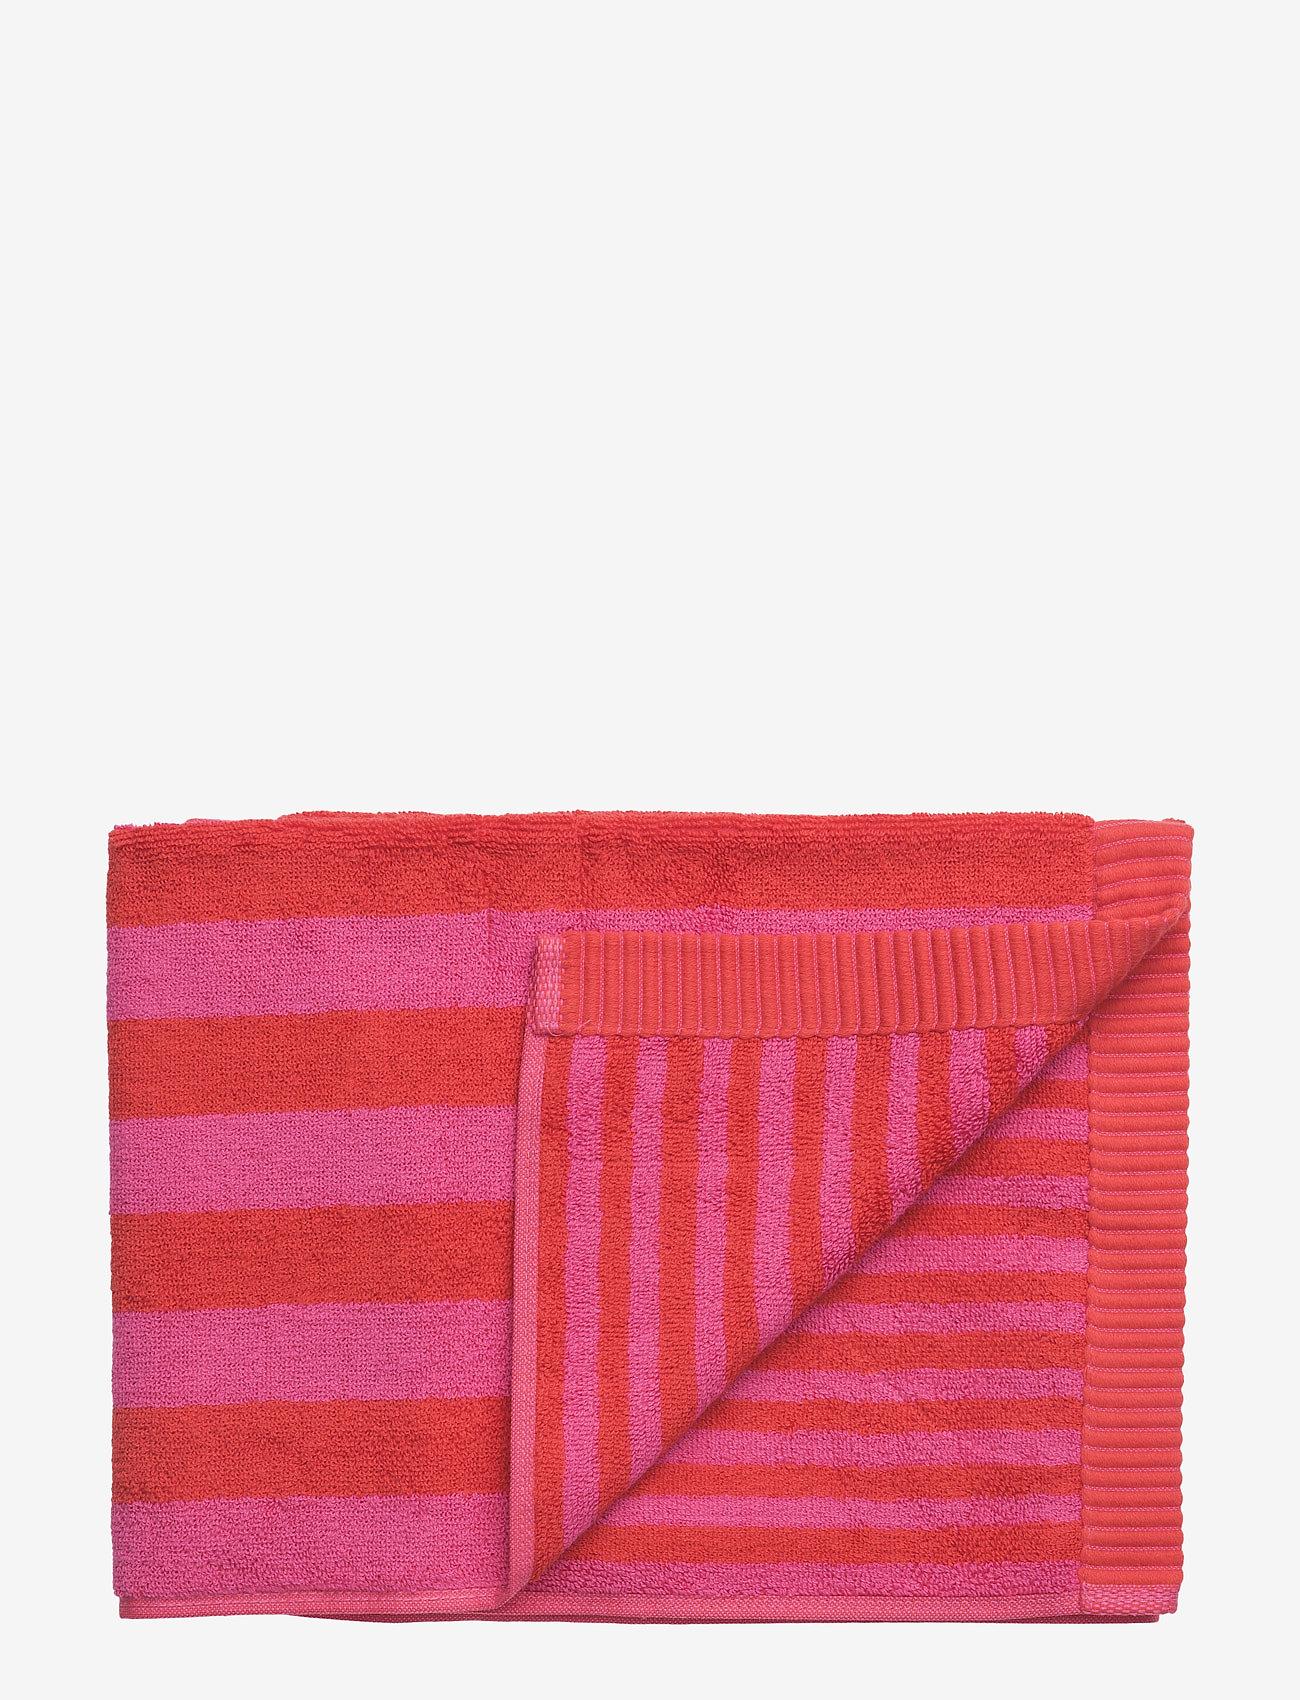 Marimekko Home - KAKSI RAITAA HAND TOWEL - hand towels & bath towels - red, red - 0